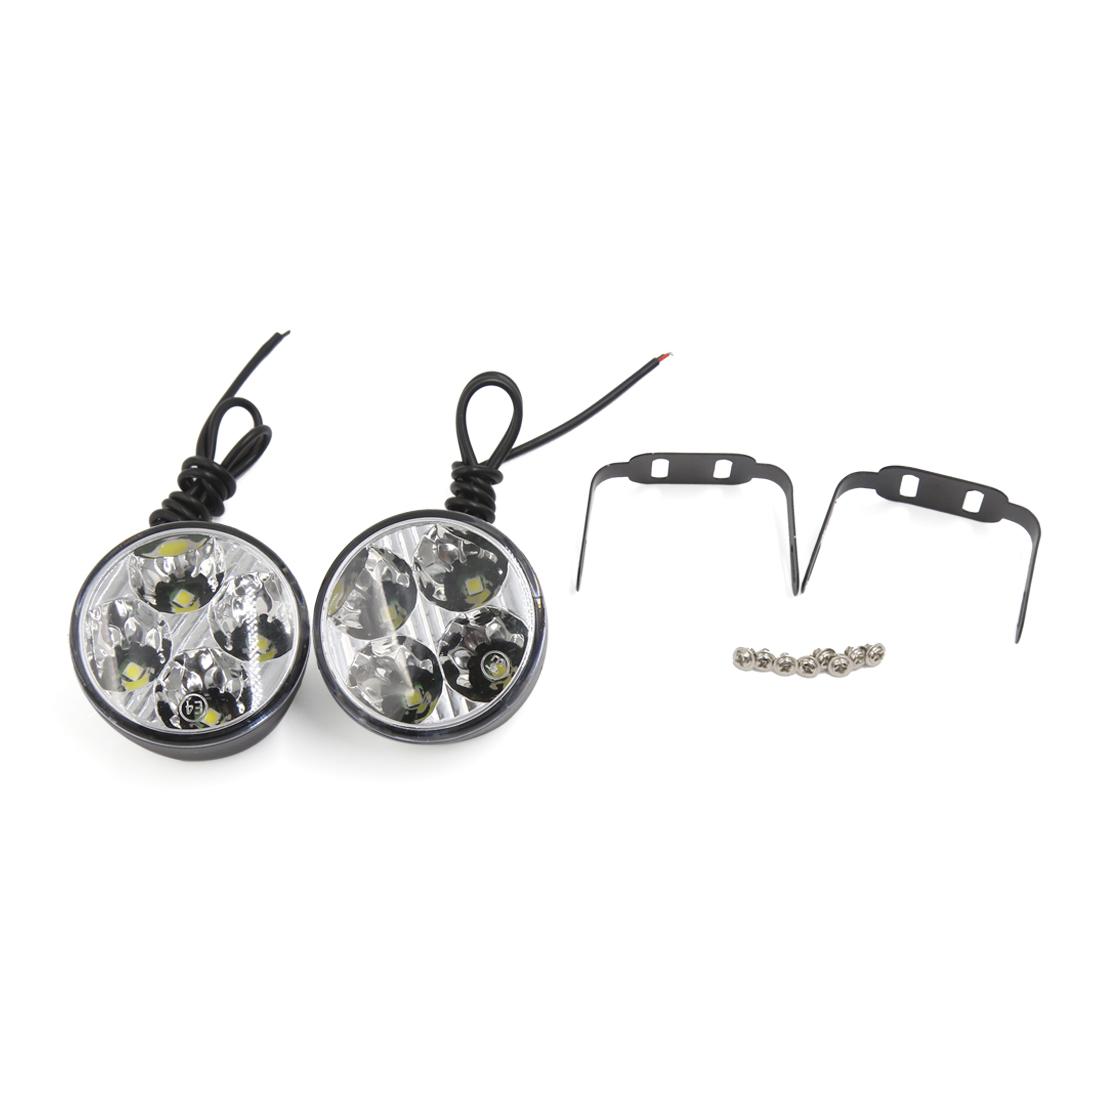 2PCS 4 LED Car DRL Driving Round Daytime Running Light Head Lamp